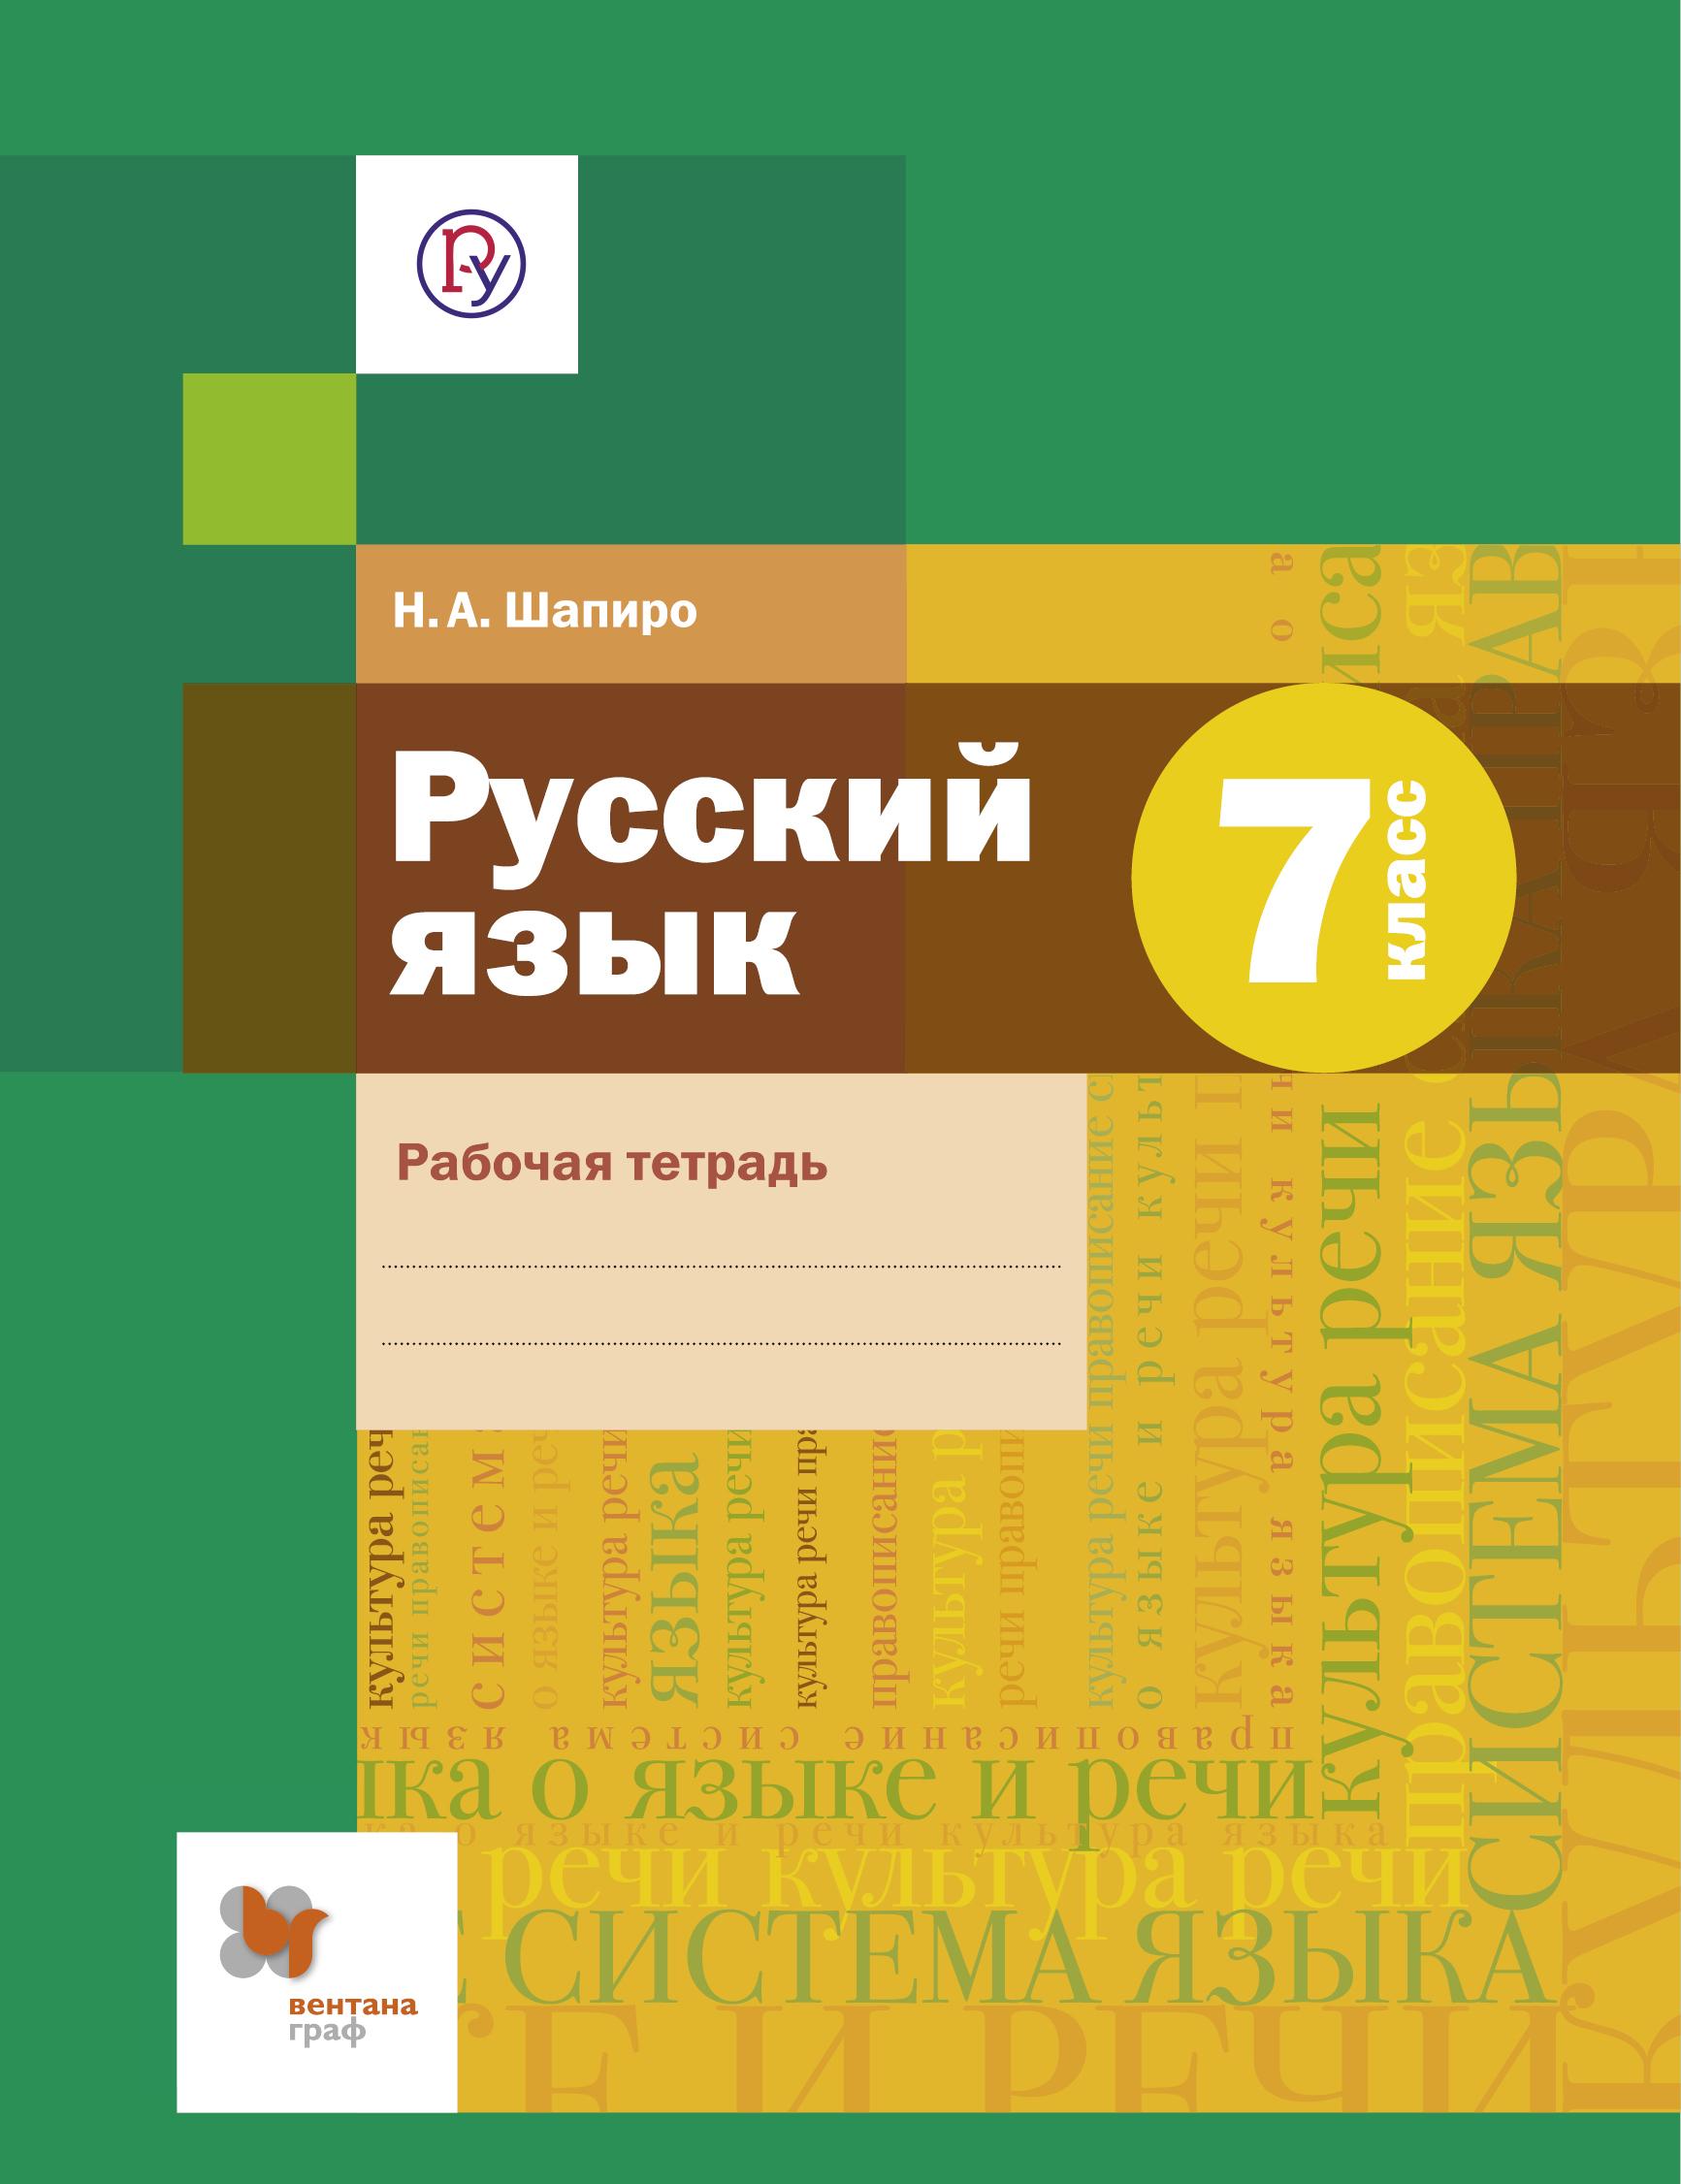 Русский язык. 7класс. Рабочая тетрадь ( Шапиро Н.А.  )